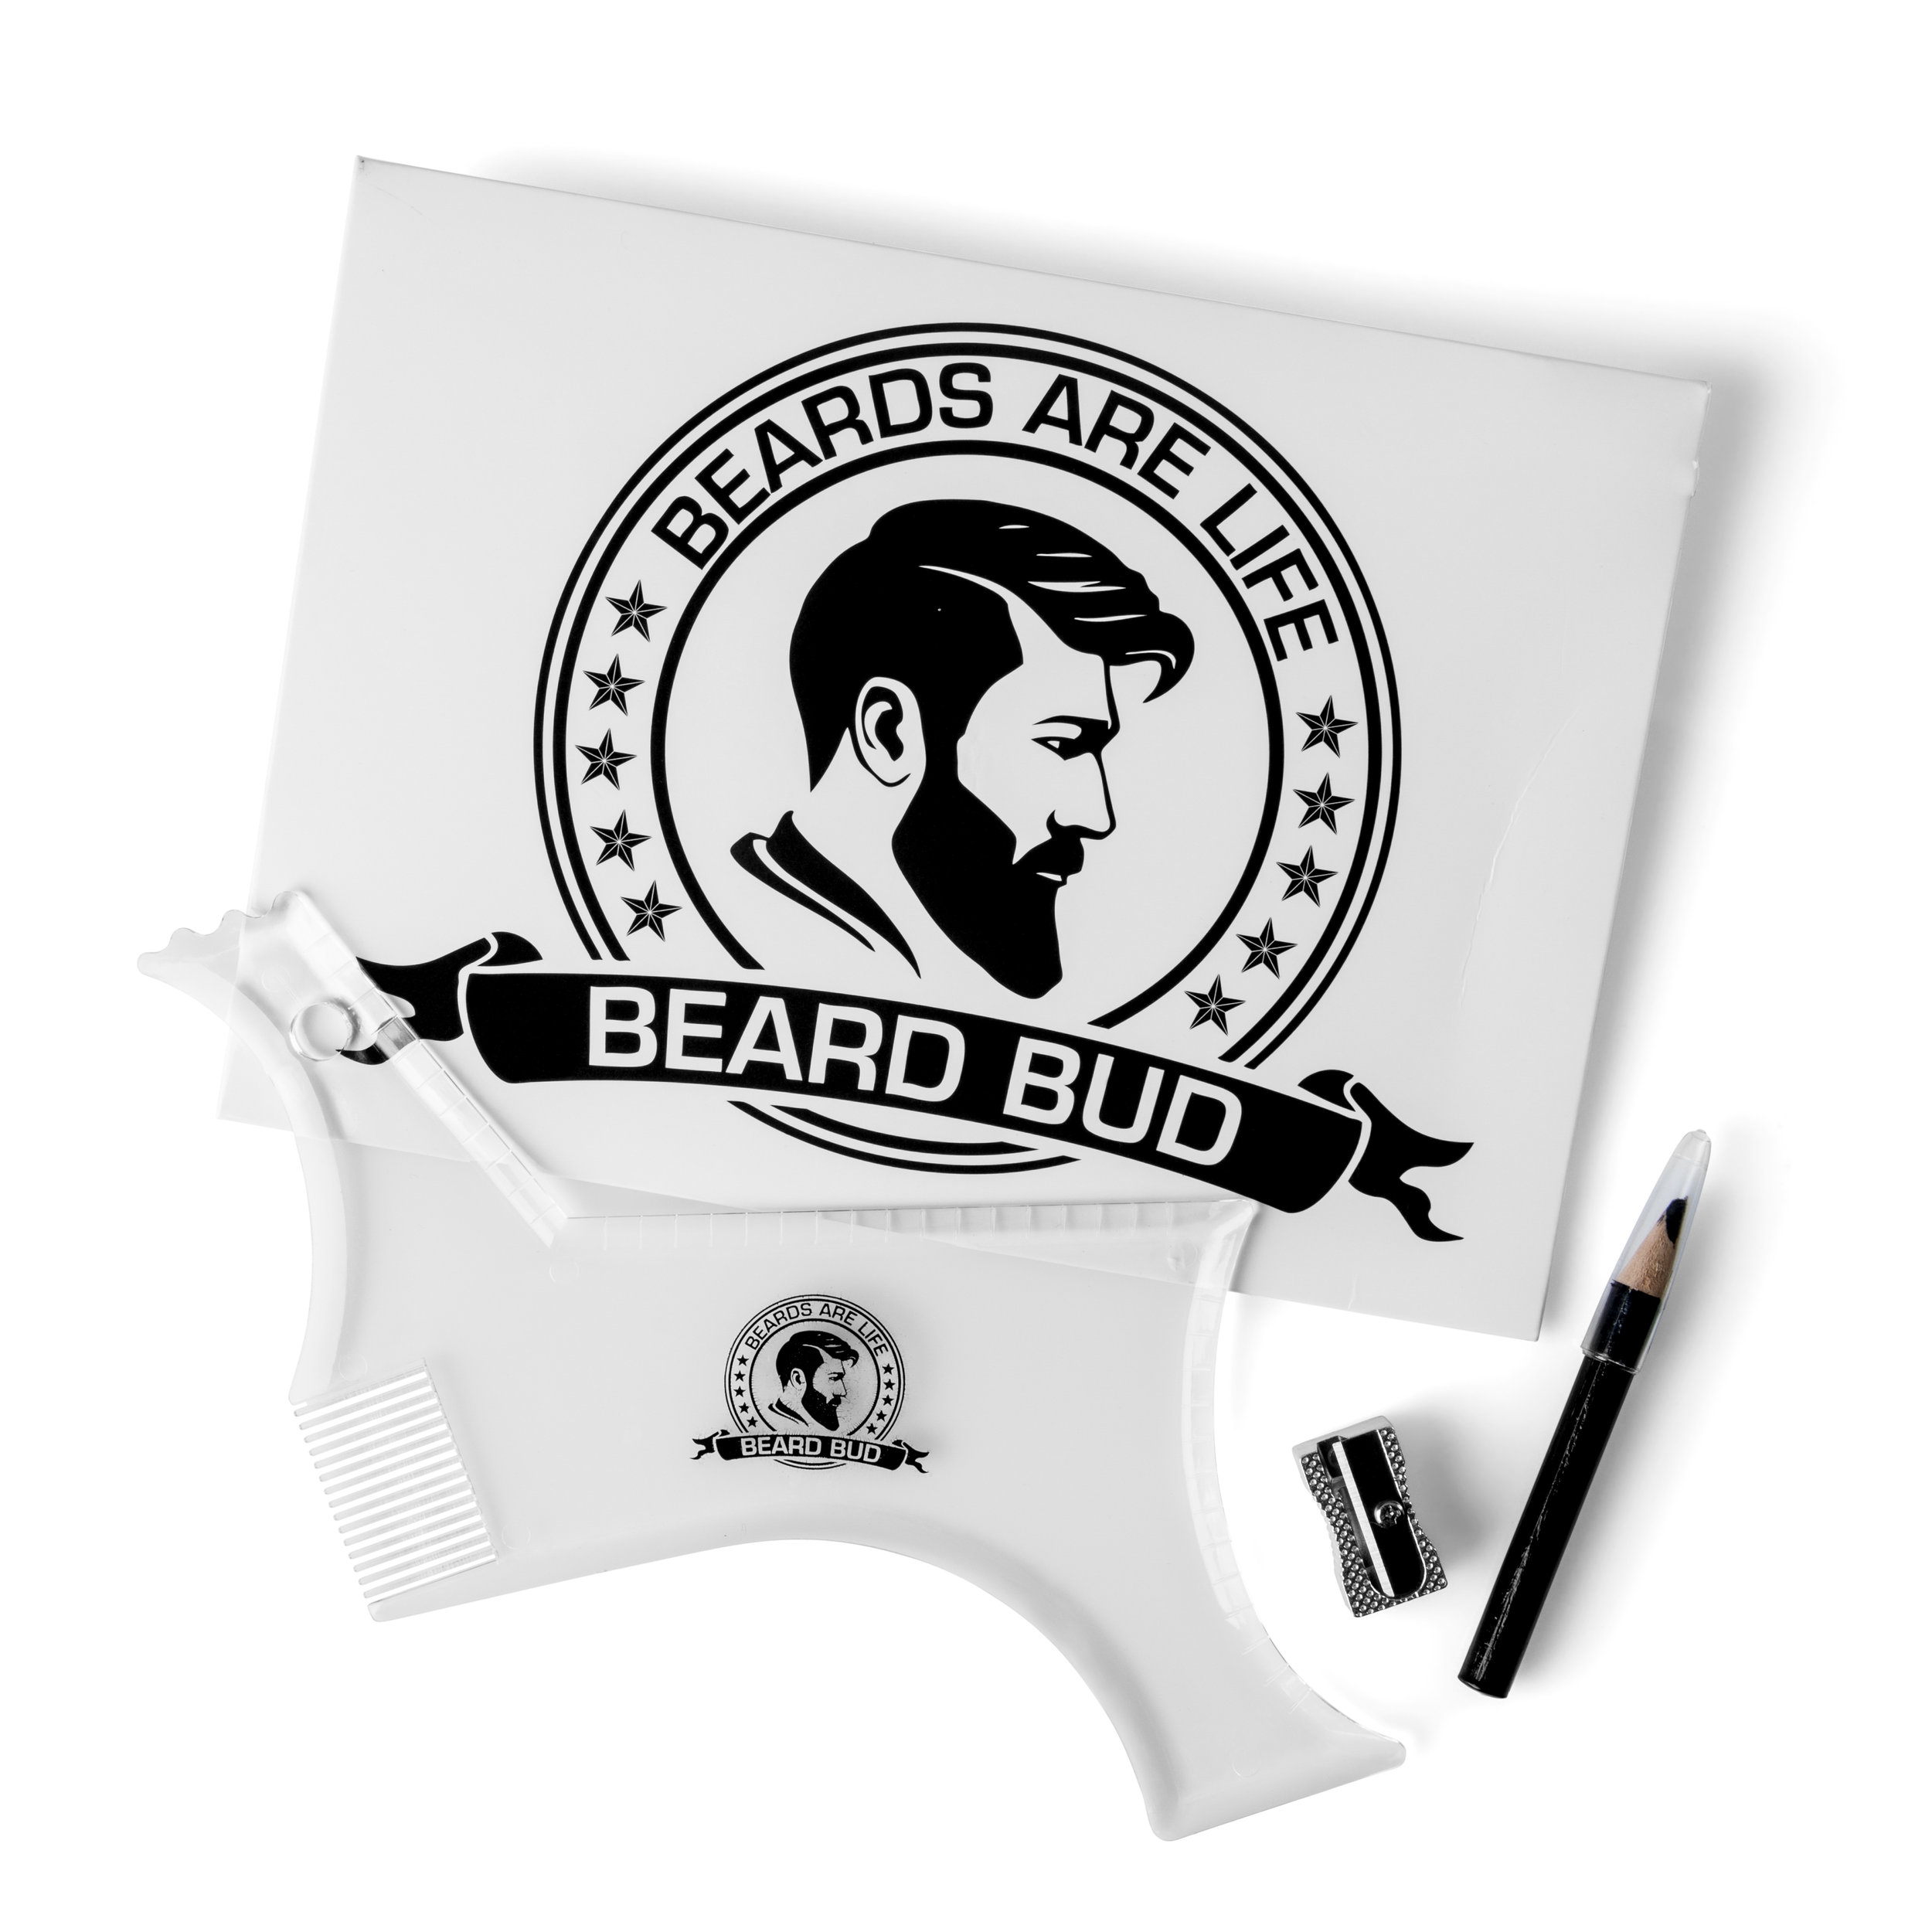 Bear-tool-set.jpg